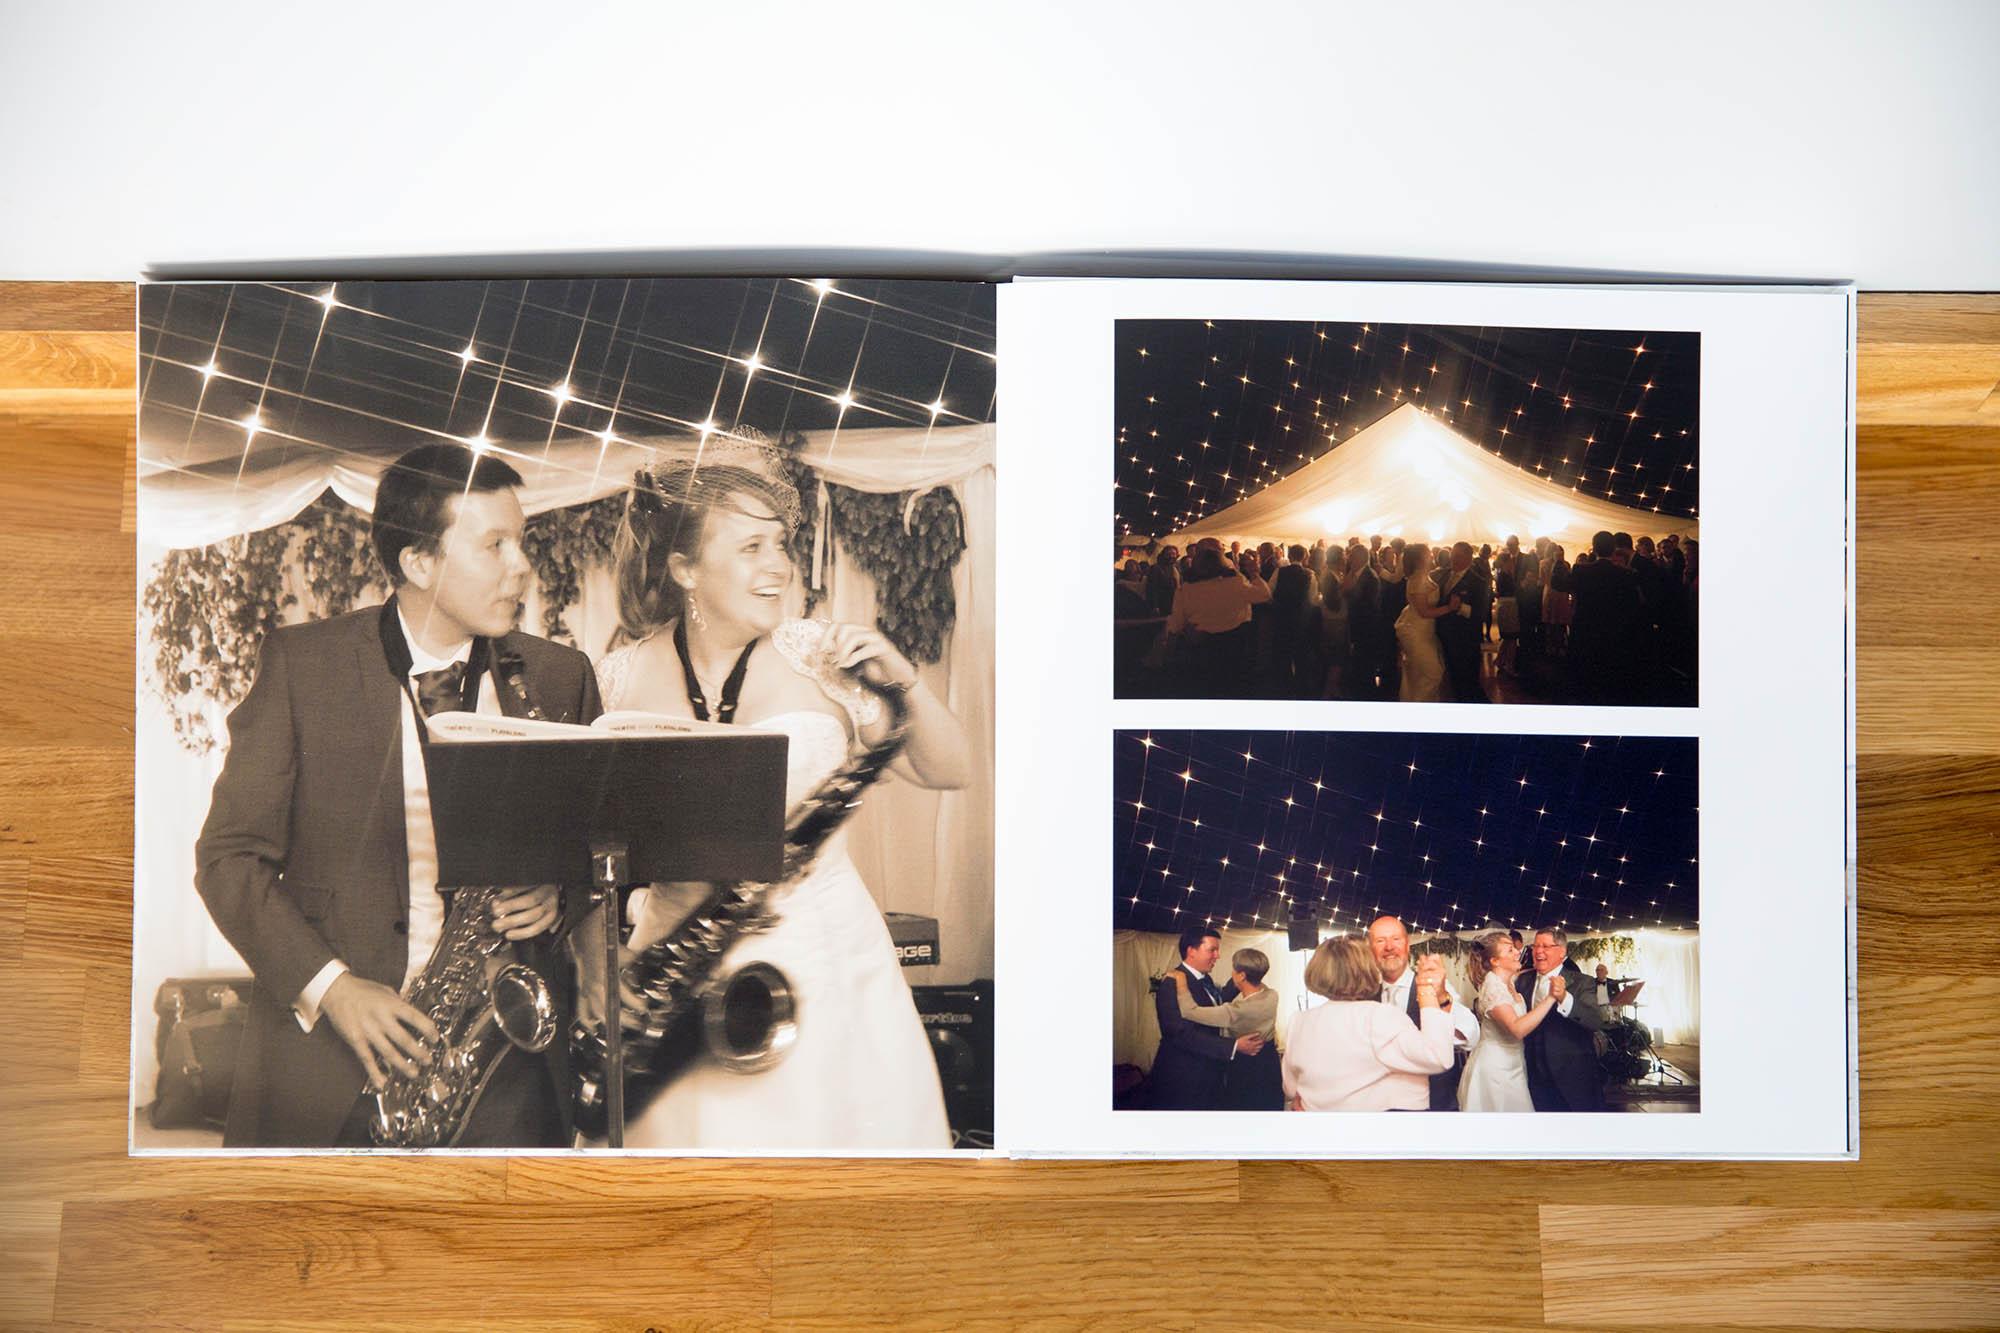 Julia_toms_wedding_album_story_book_043.jpg